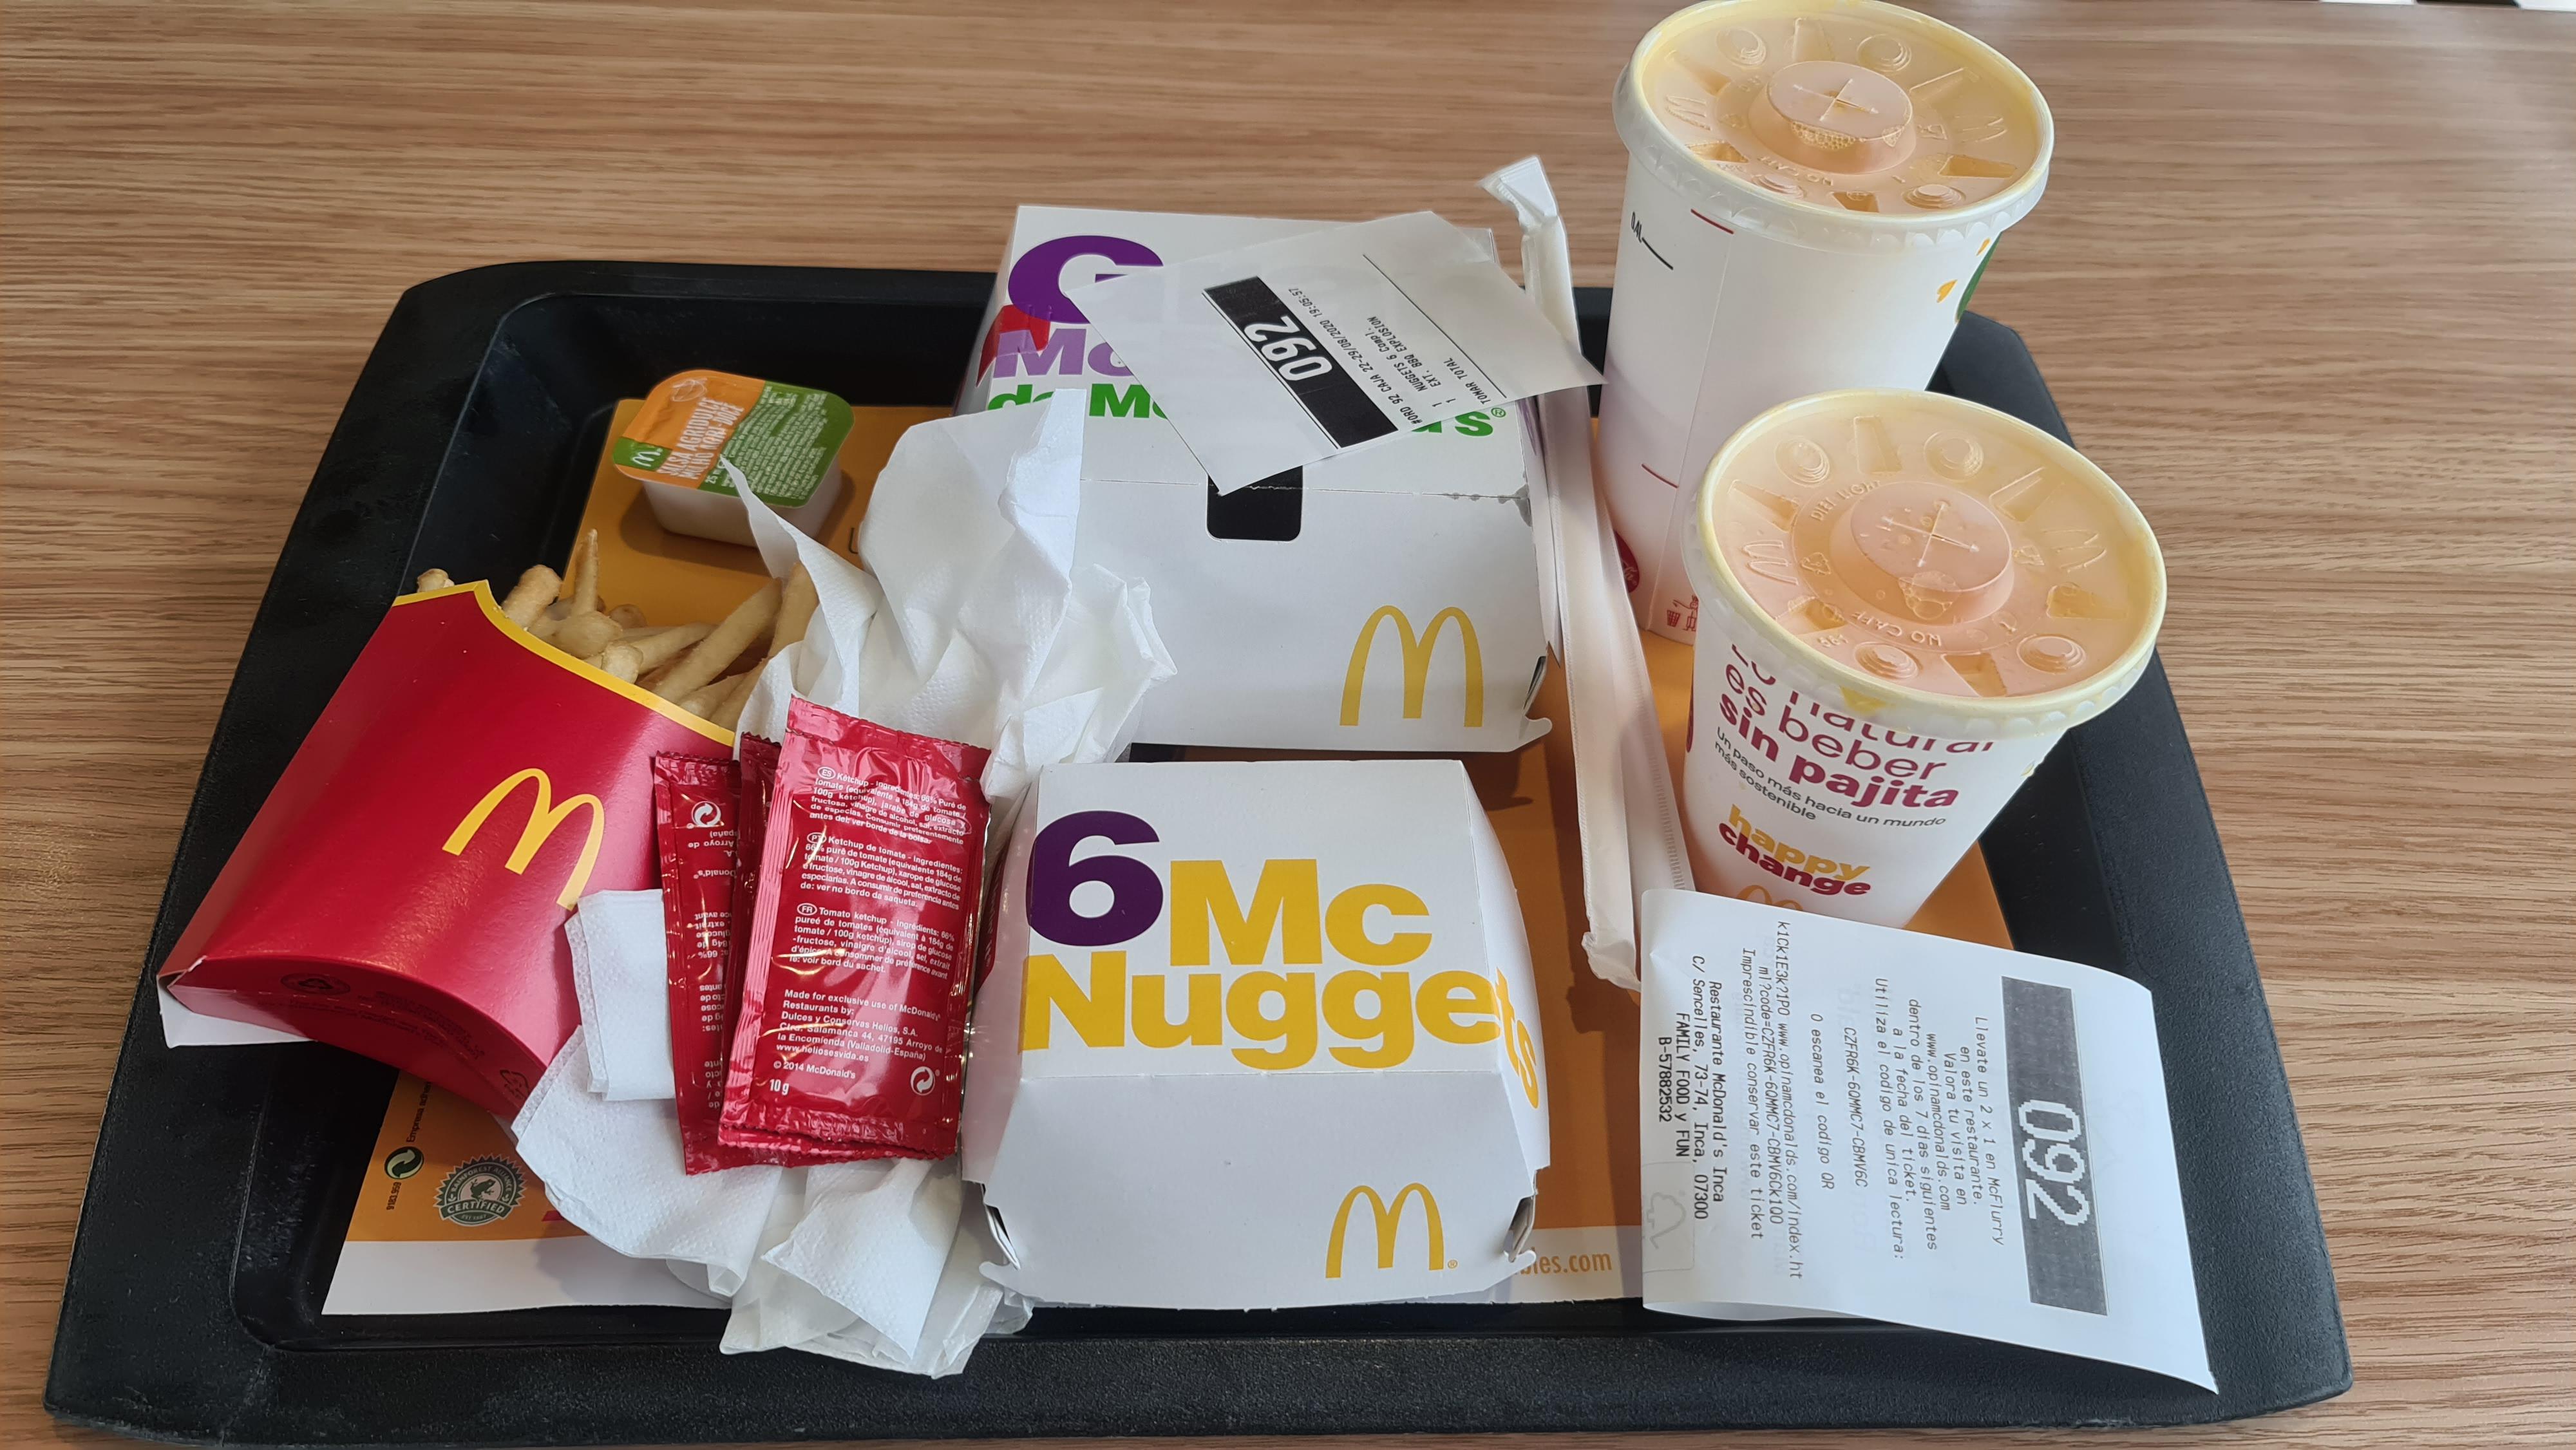 https://foodloader.net/Holz_2020-08-29_McDonalds.jpg